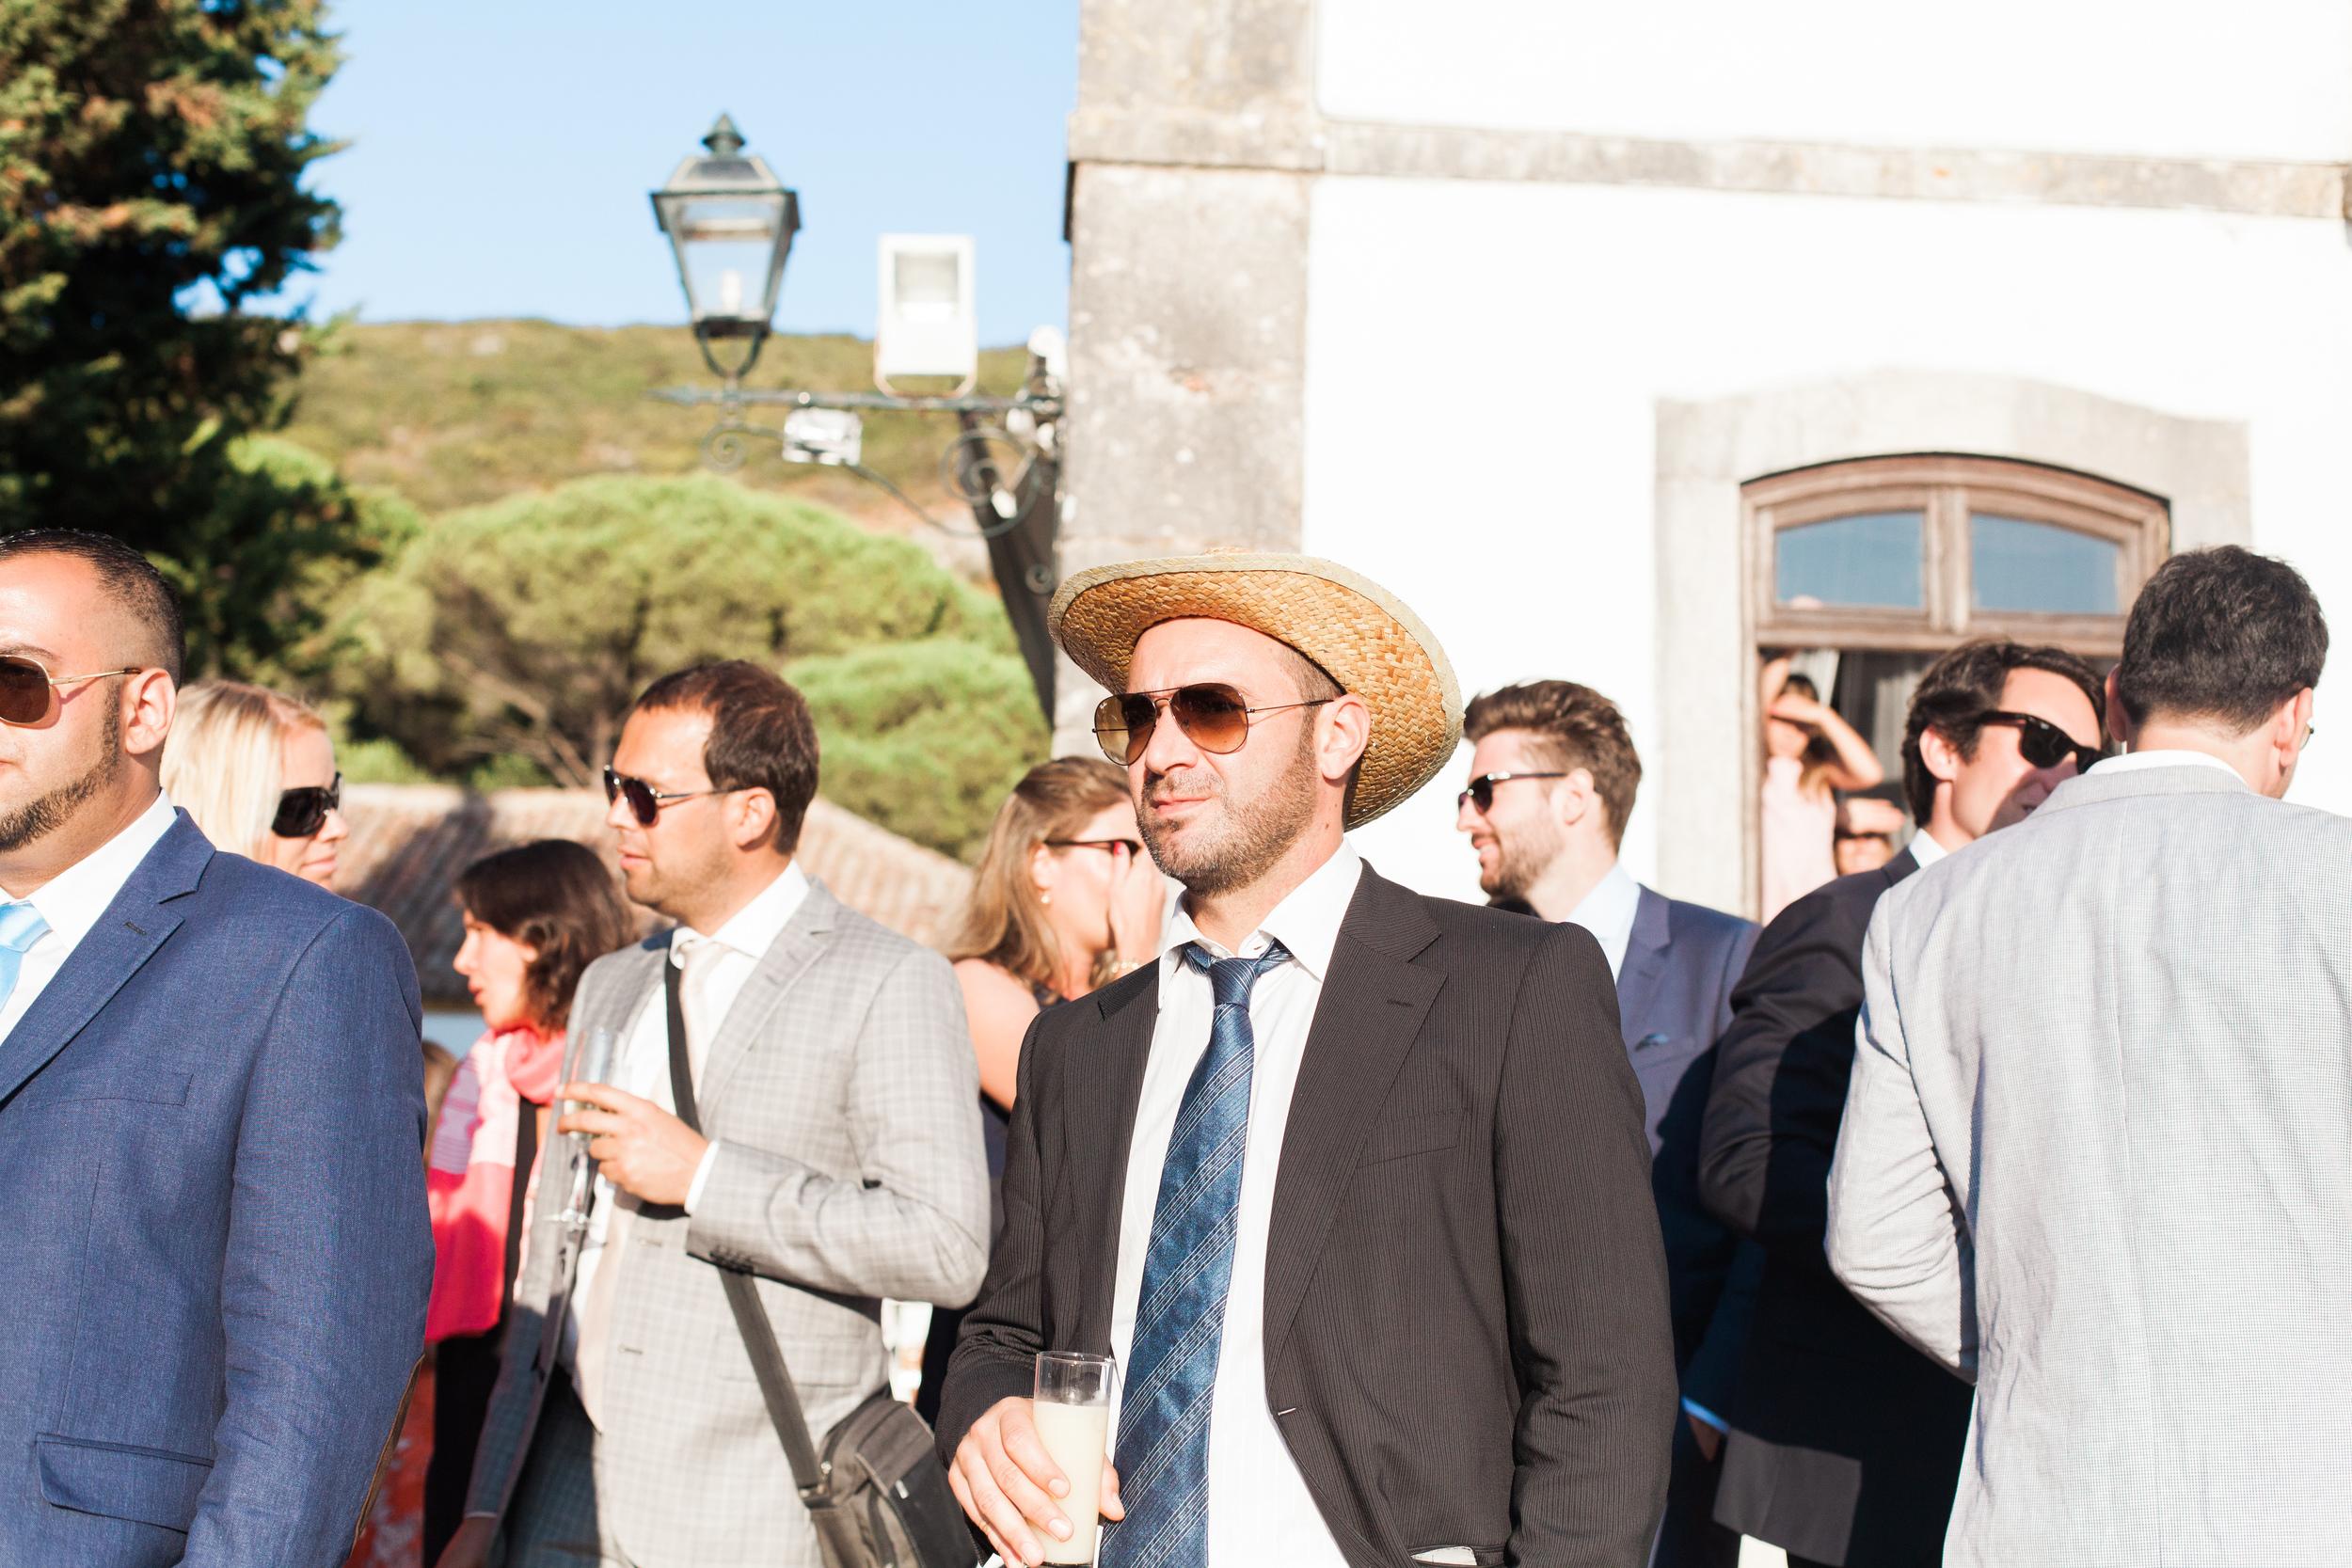 mariarao+wedding+quinta+del+carmen-501.jpg